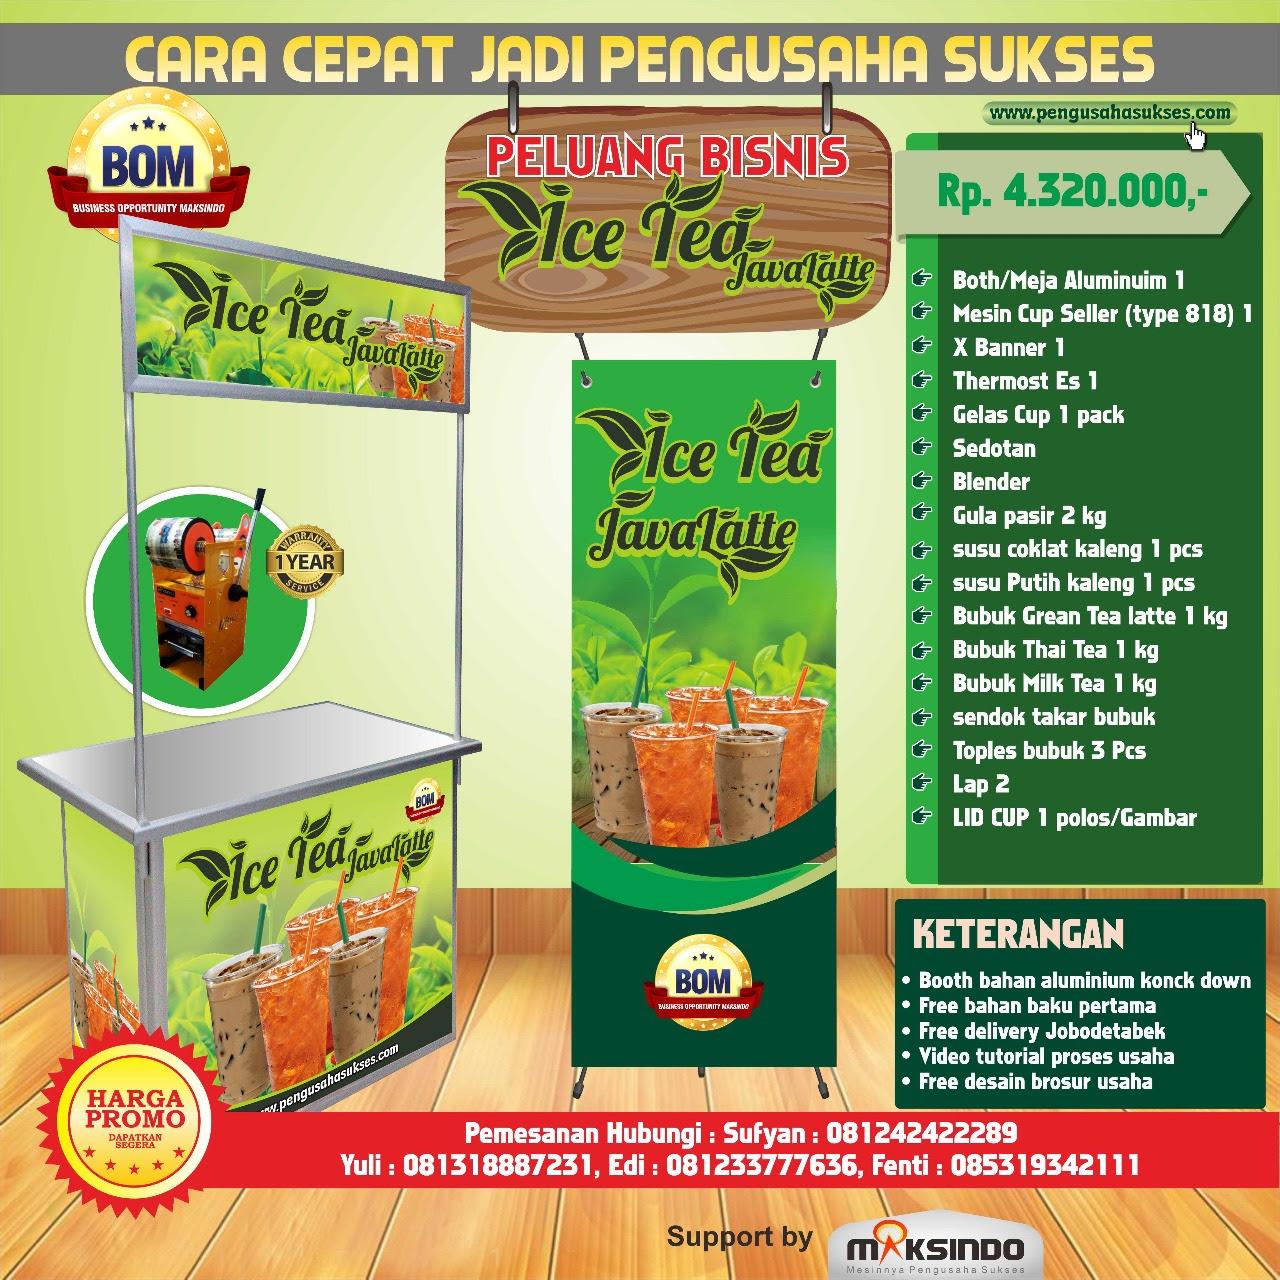 Gambar Banner Frozen Food - contoh desain spanduk